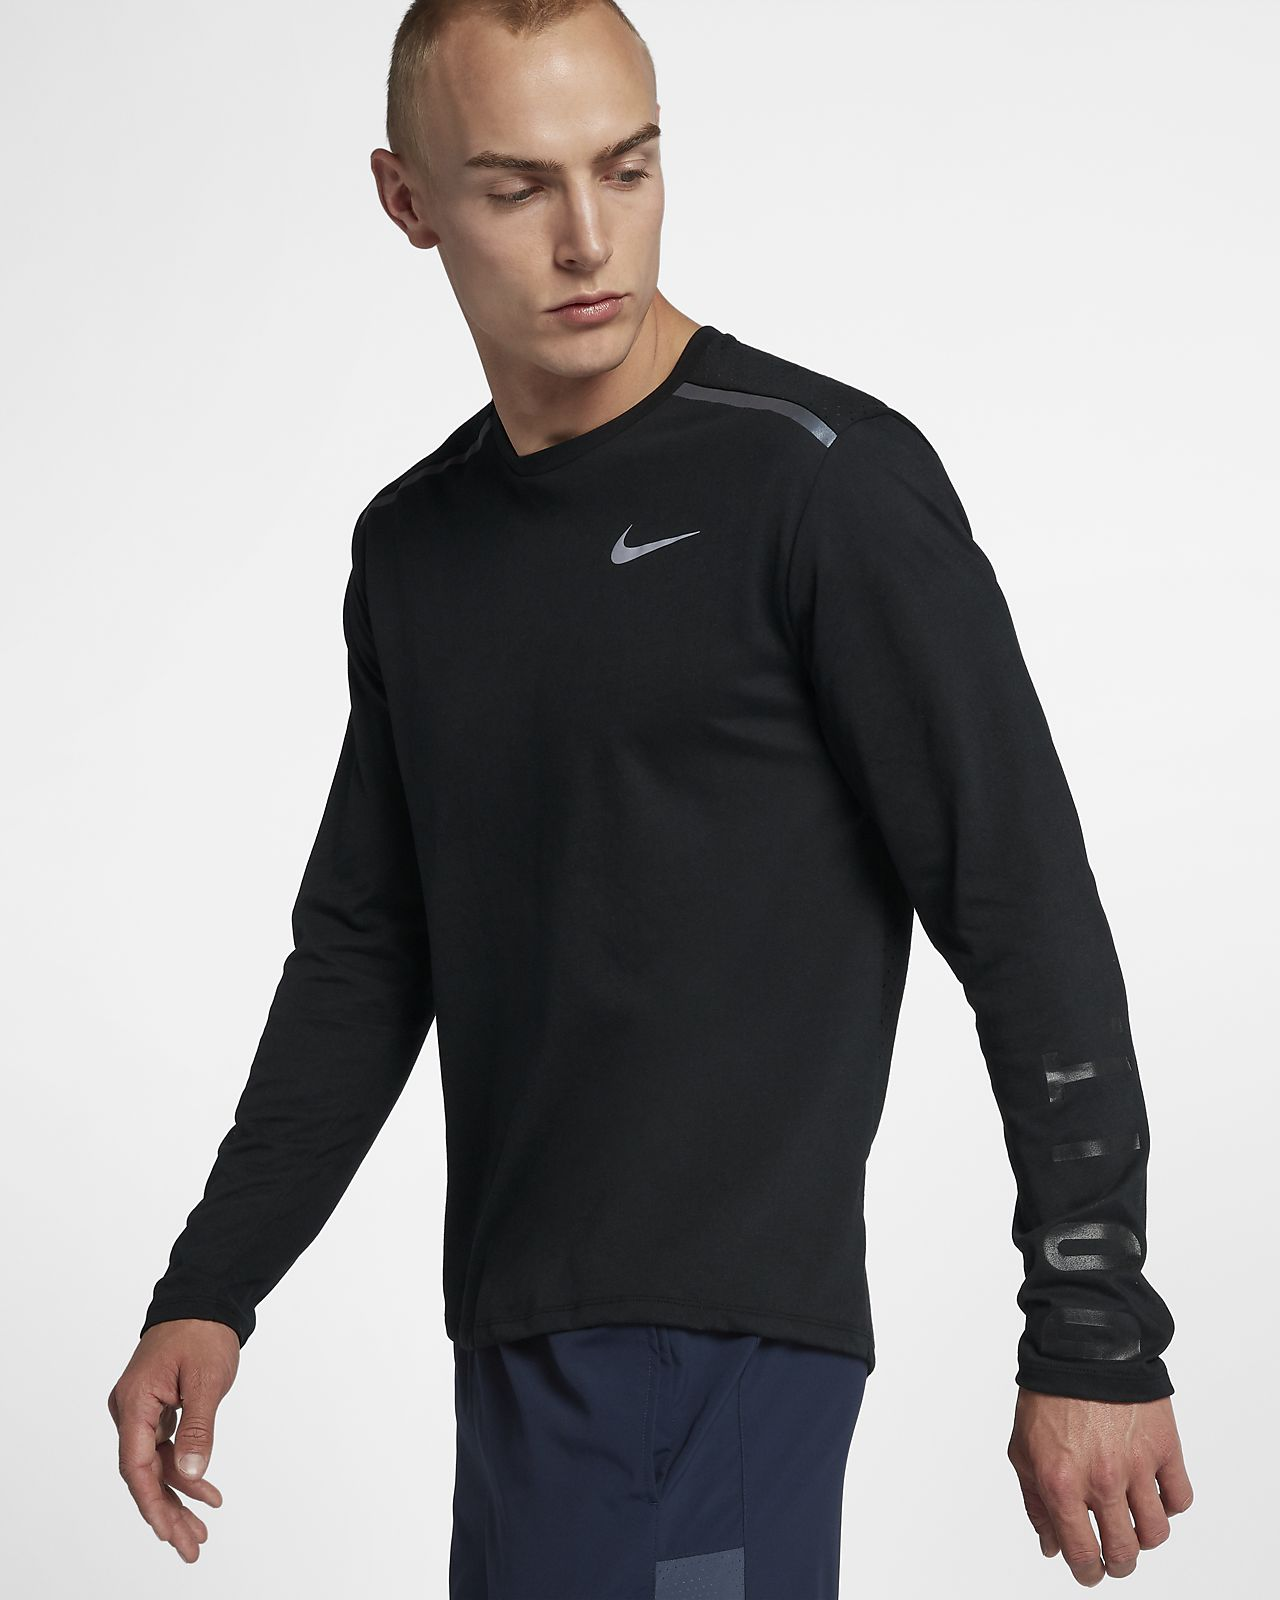 c1e5a11b45 Nike Tailwind Men's Long-Sleeve Running Top. Nike.com CA